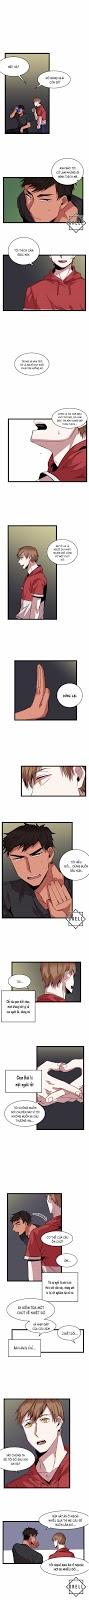 Trang 3 - [ Manhwa ] Trái tim thầm lặng - Heart Silent - Chap 008 (- Han Kyeul) - Truyện tranh Gay - Server HostedOnGoogleServerStaging